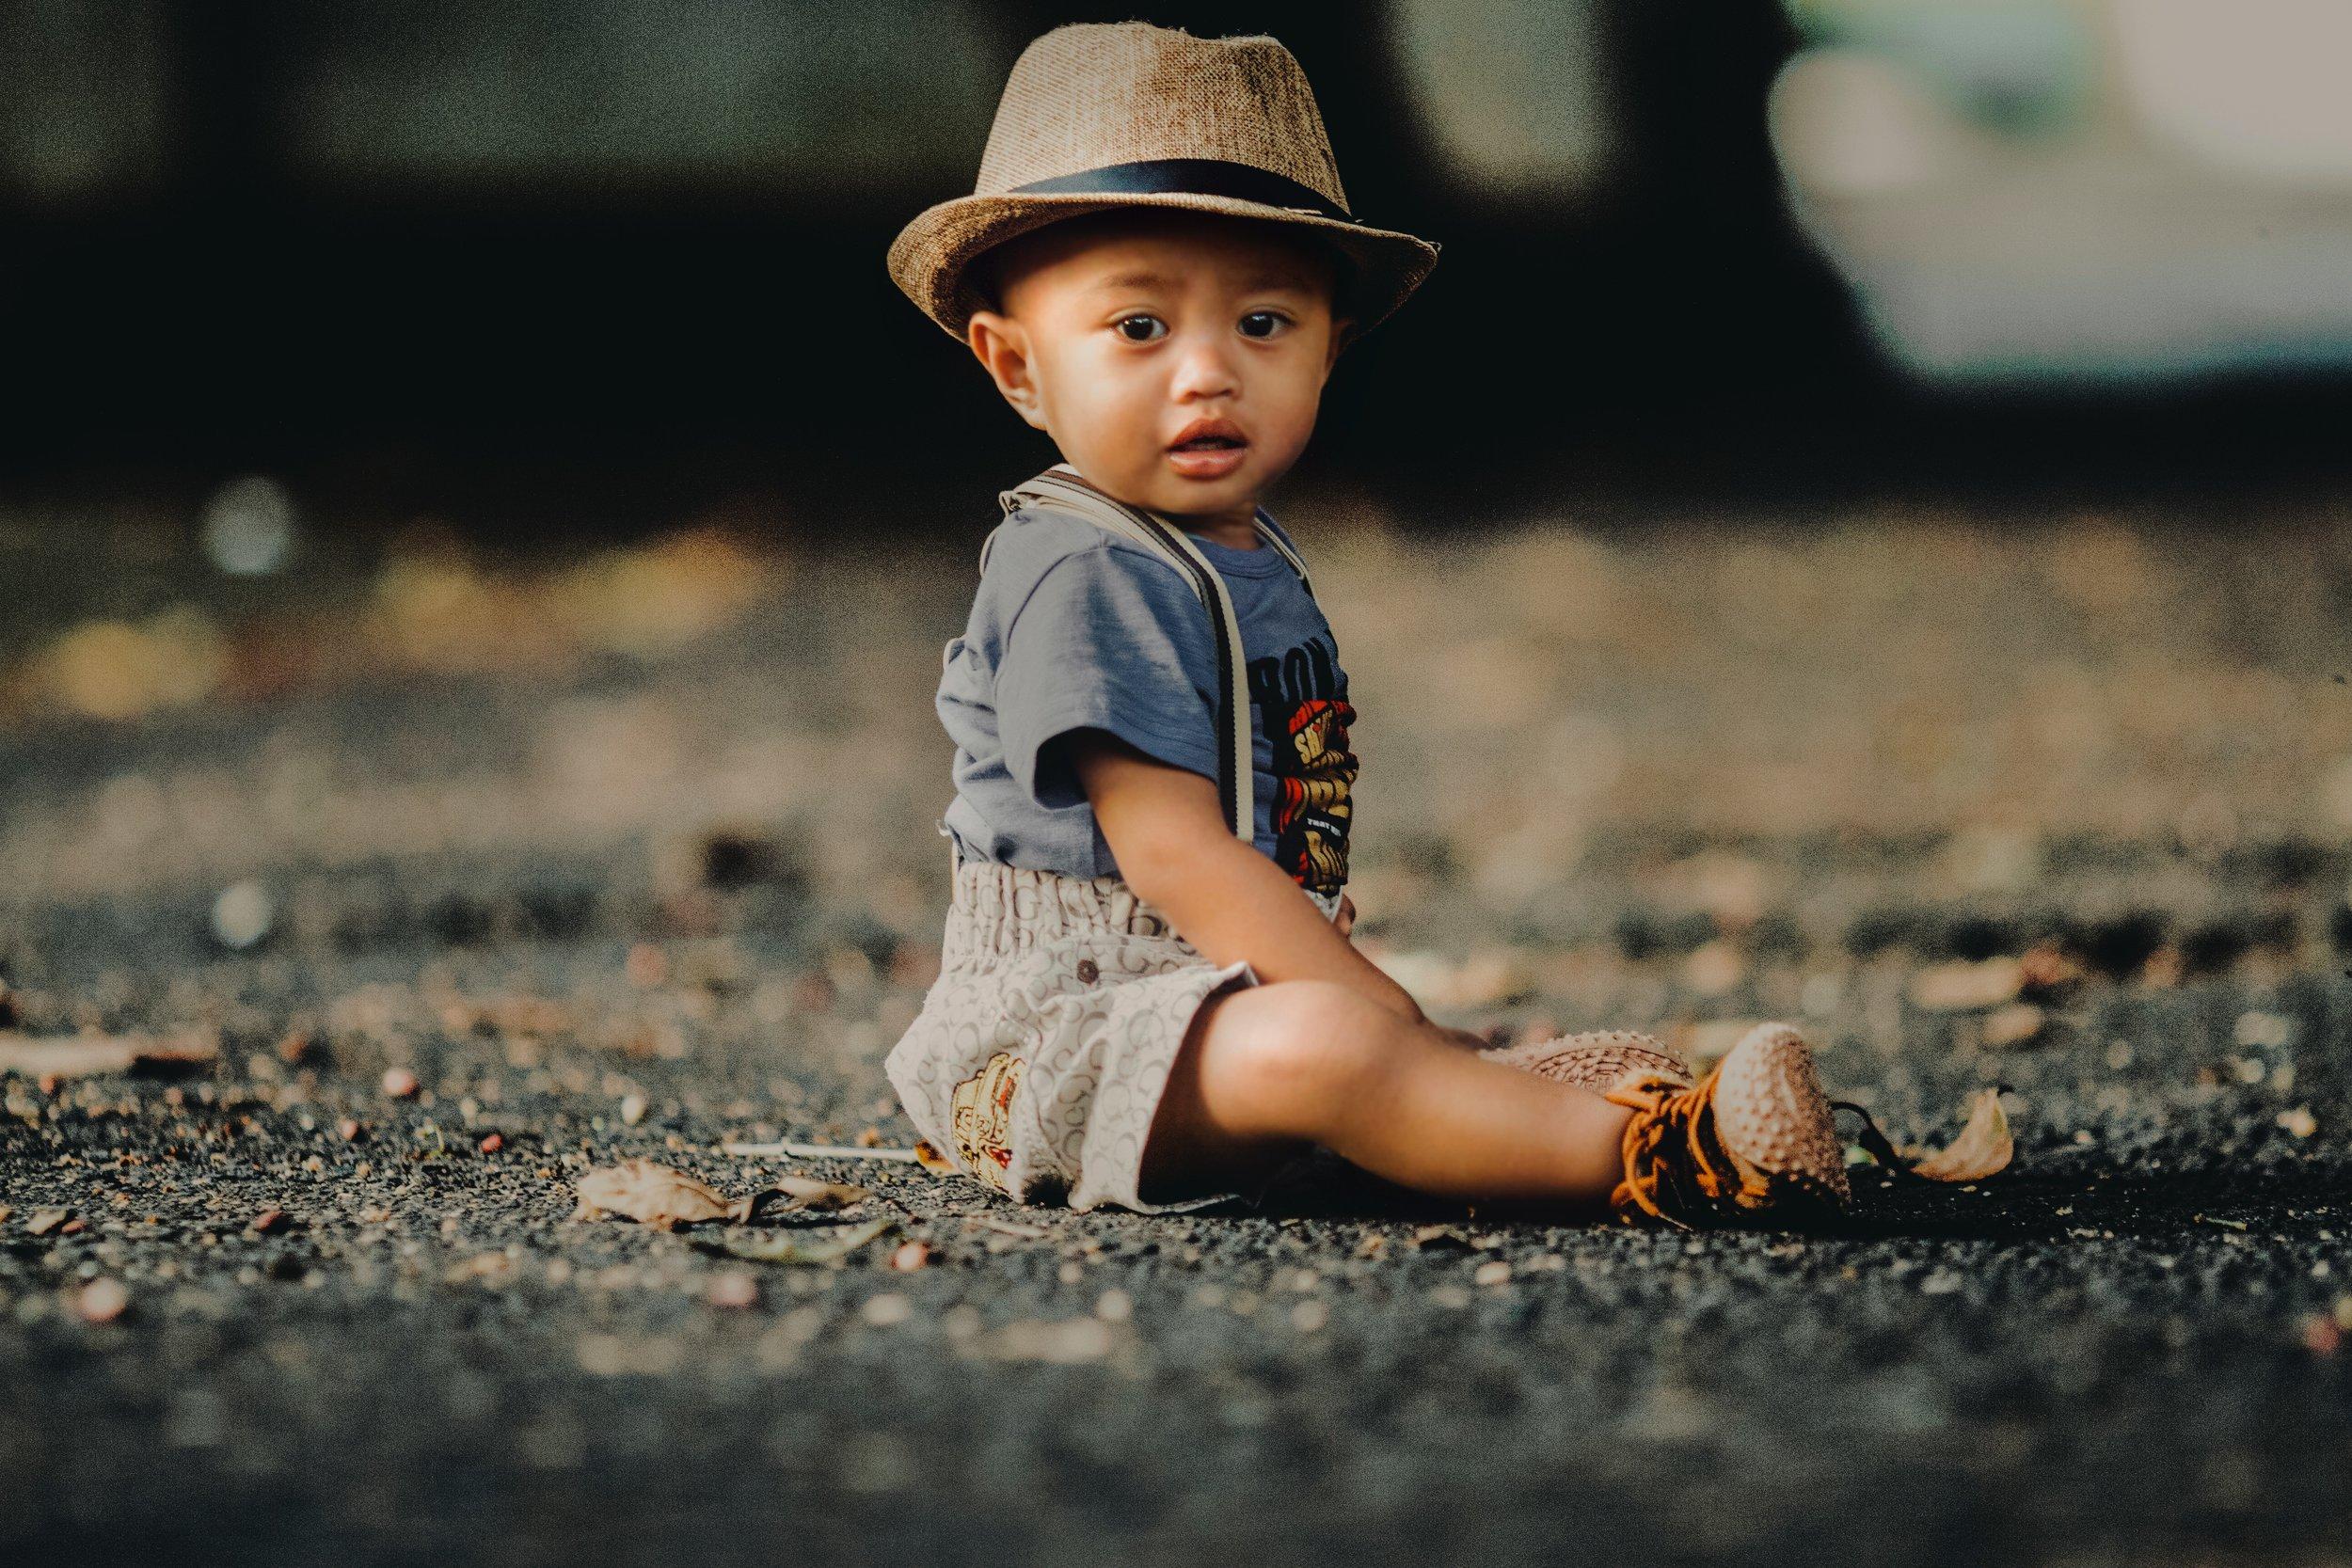 adorable-baby-boy-786220_Denafi Sy_Pexels.jpg